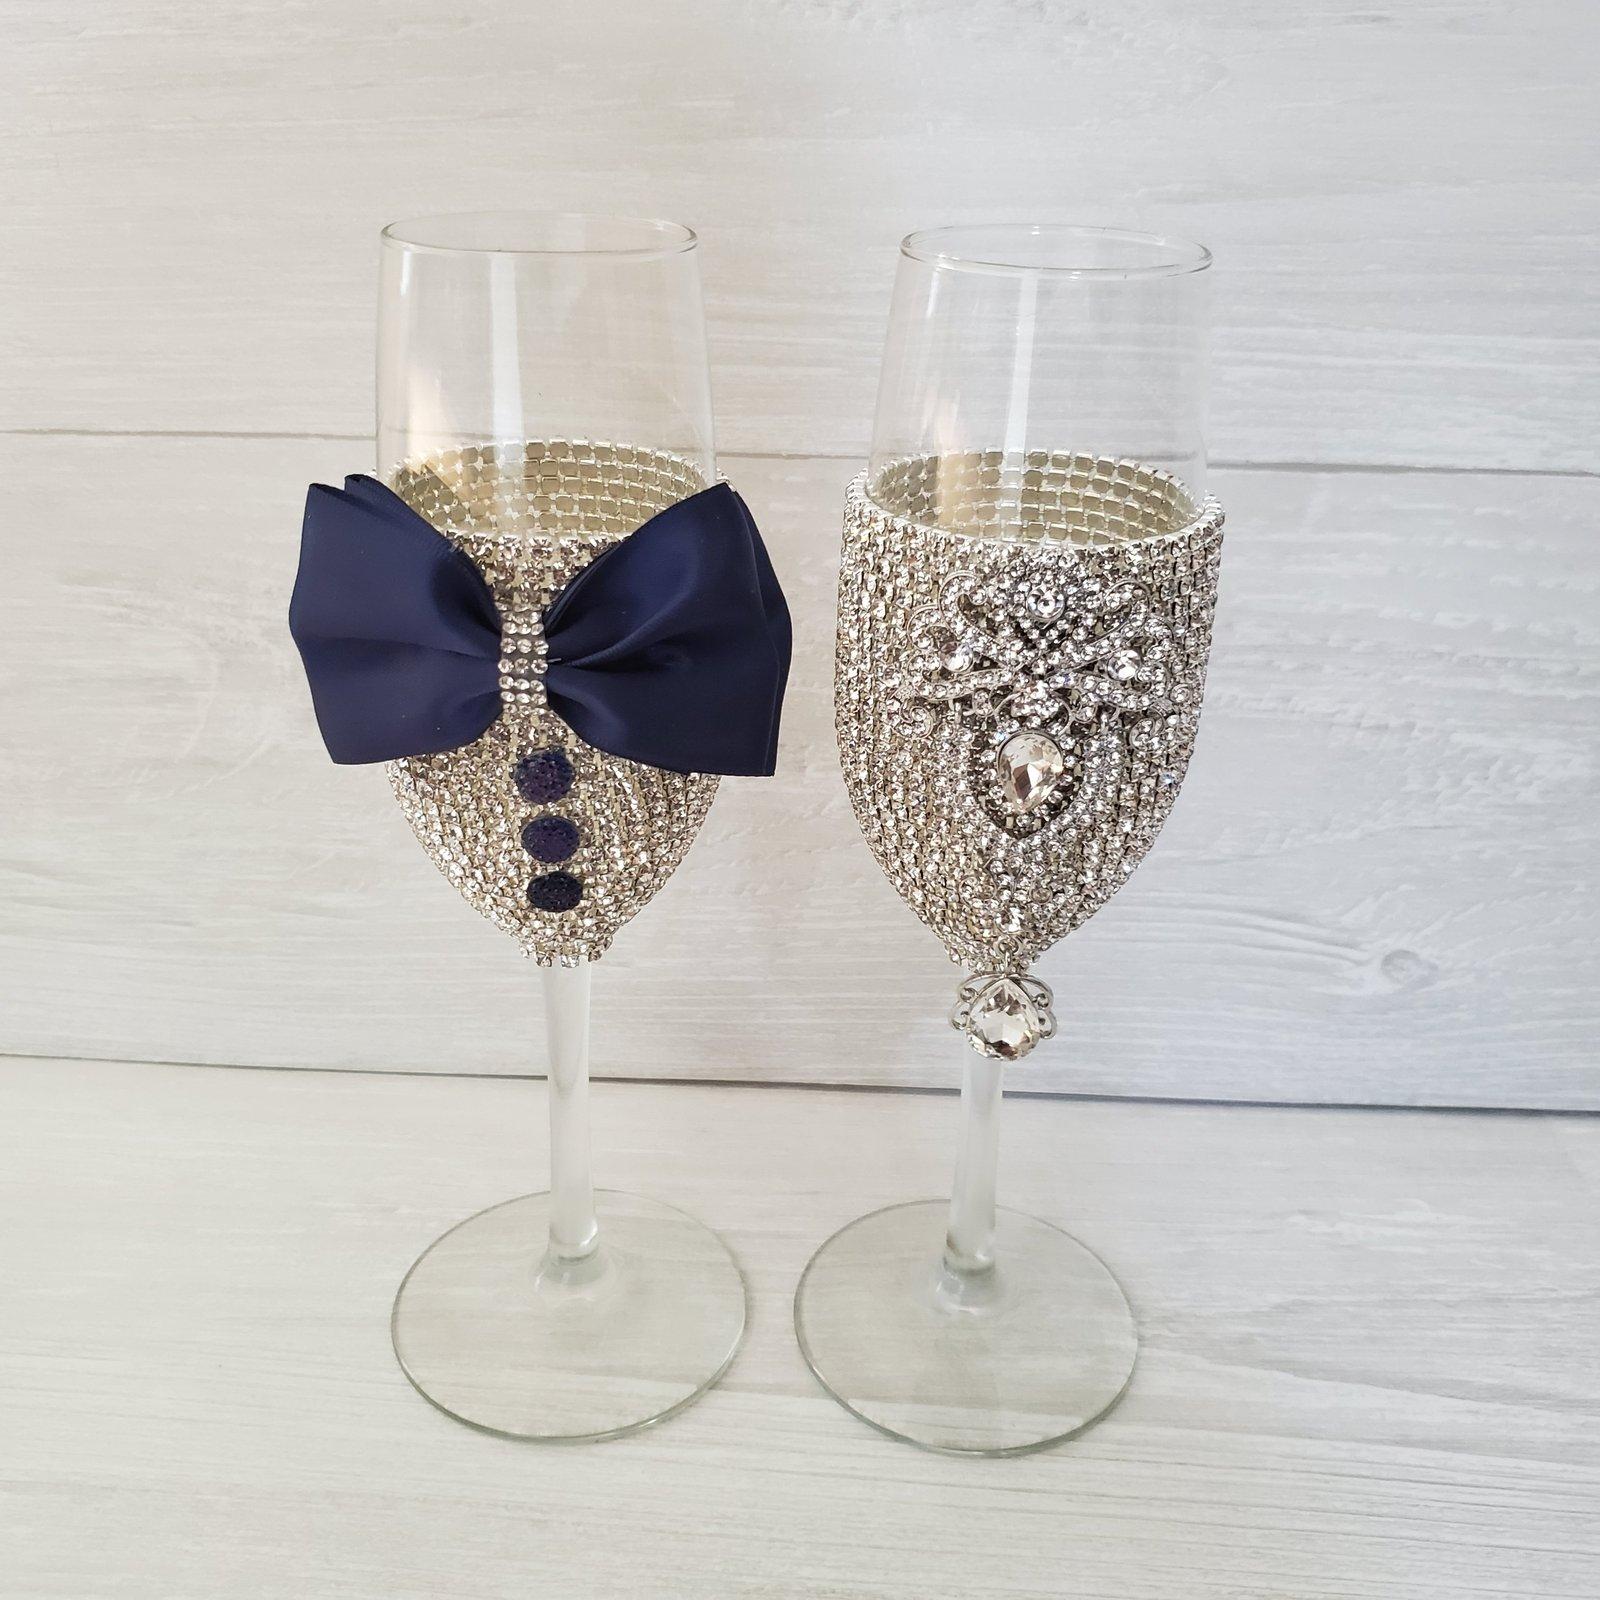 Rhinestone Bottle and champagne glasses